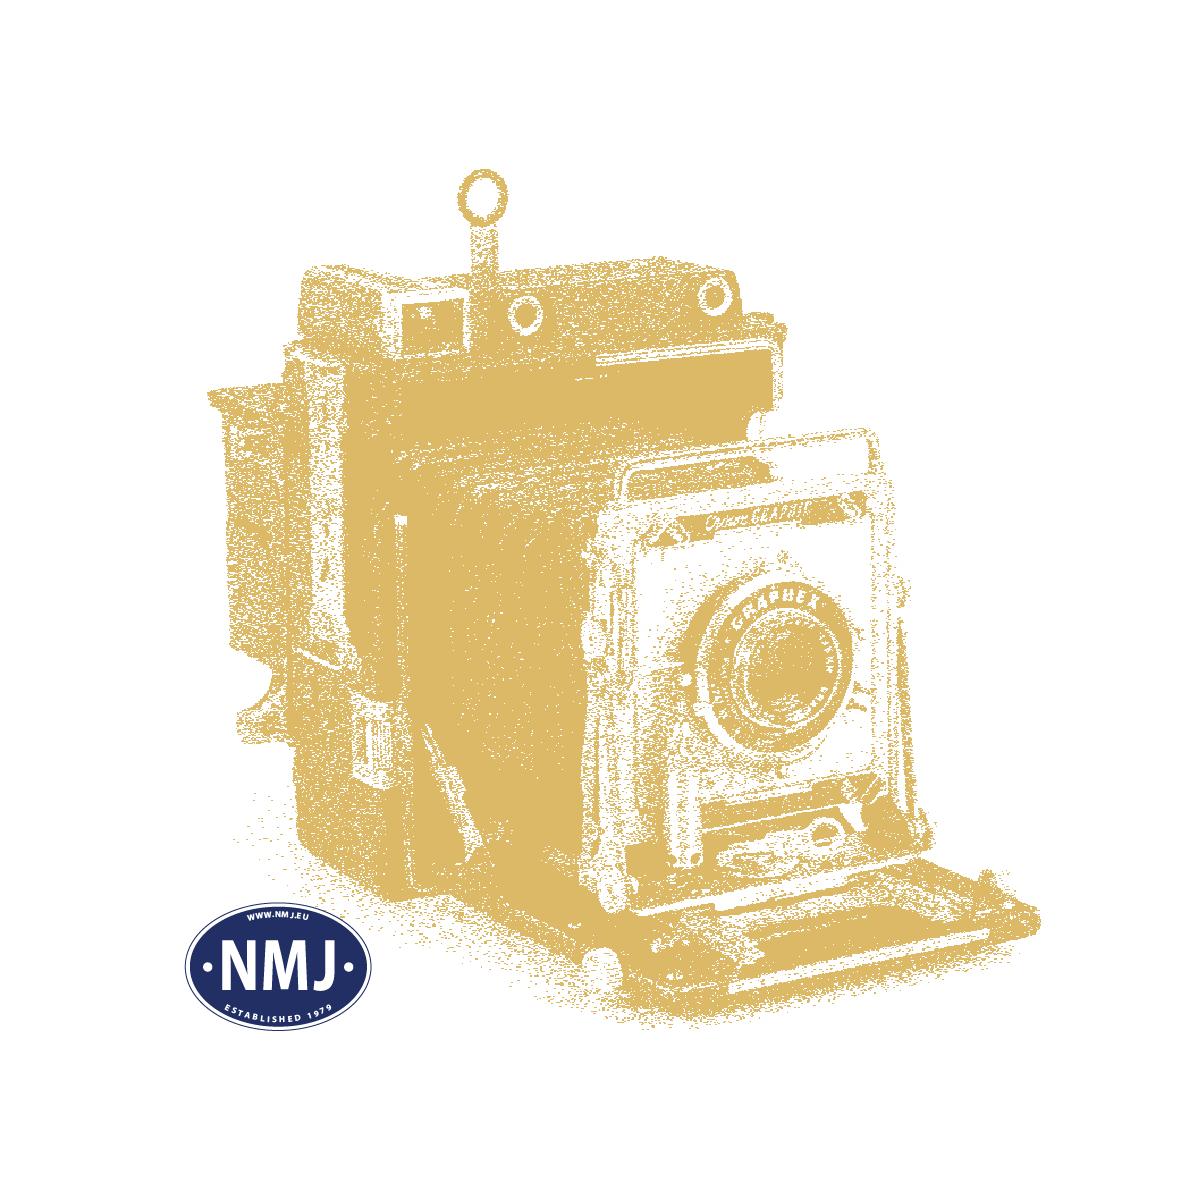 NMJT131.301 - NMJ Topline NSB B3-2 Type 3 25516, rot